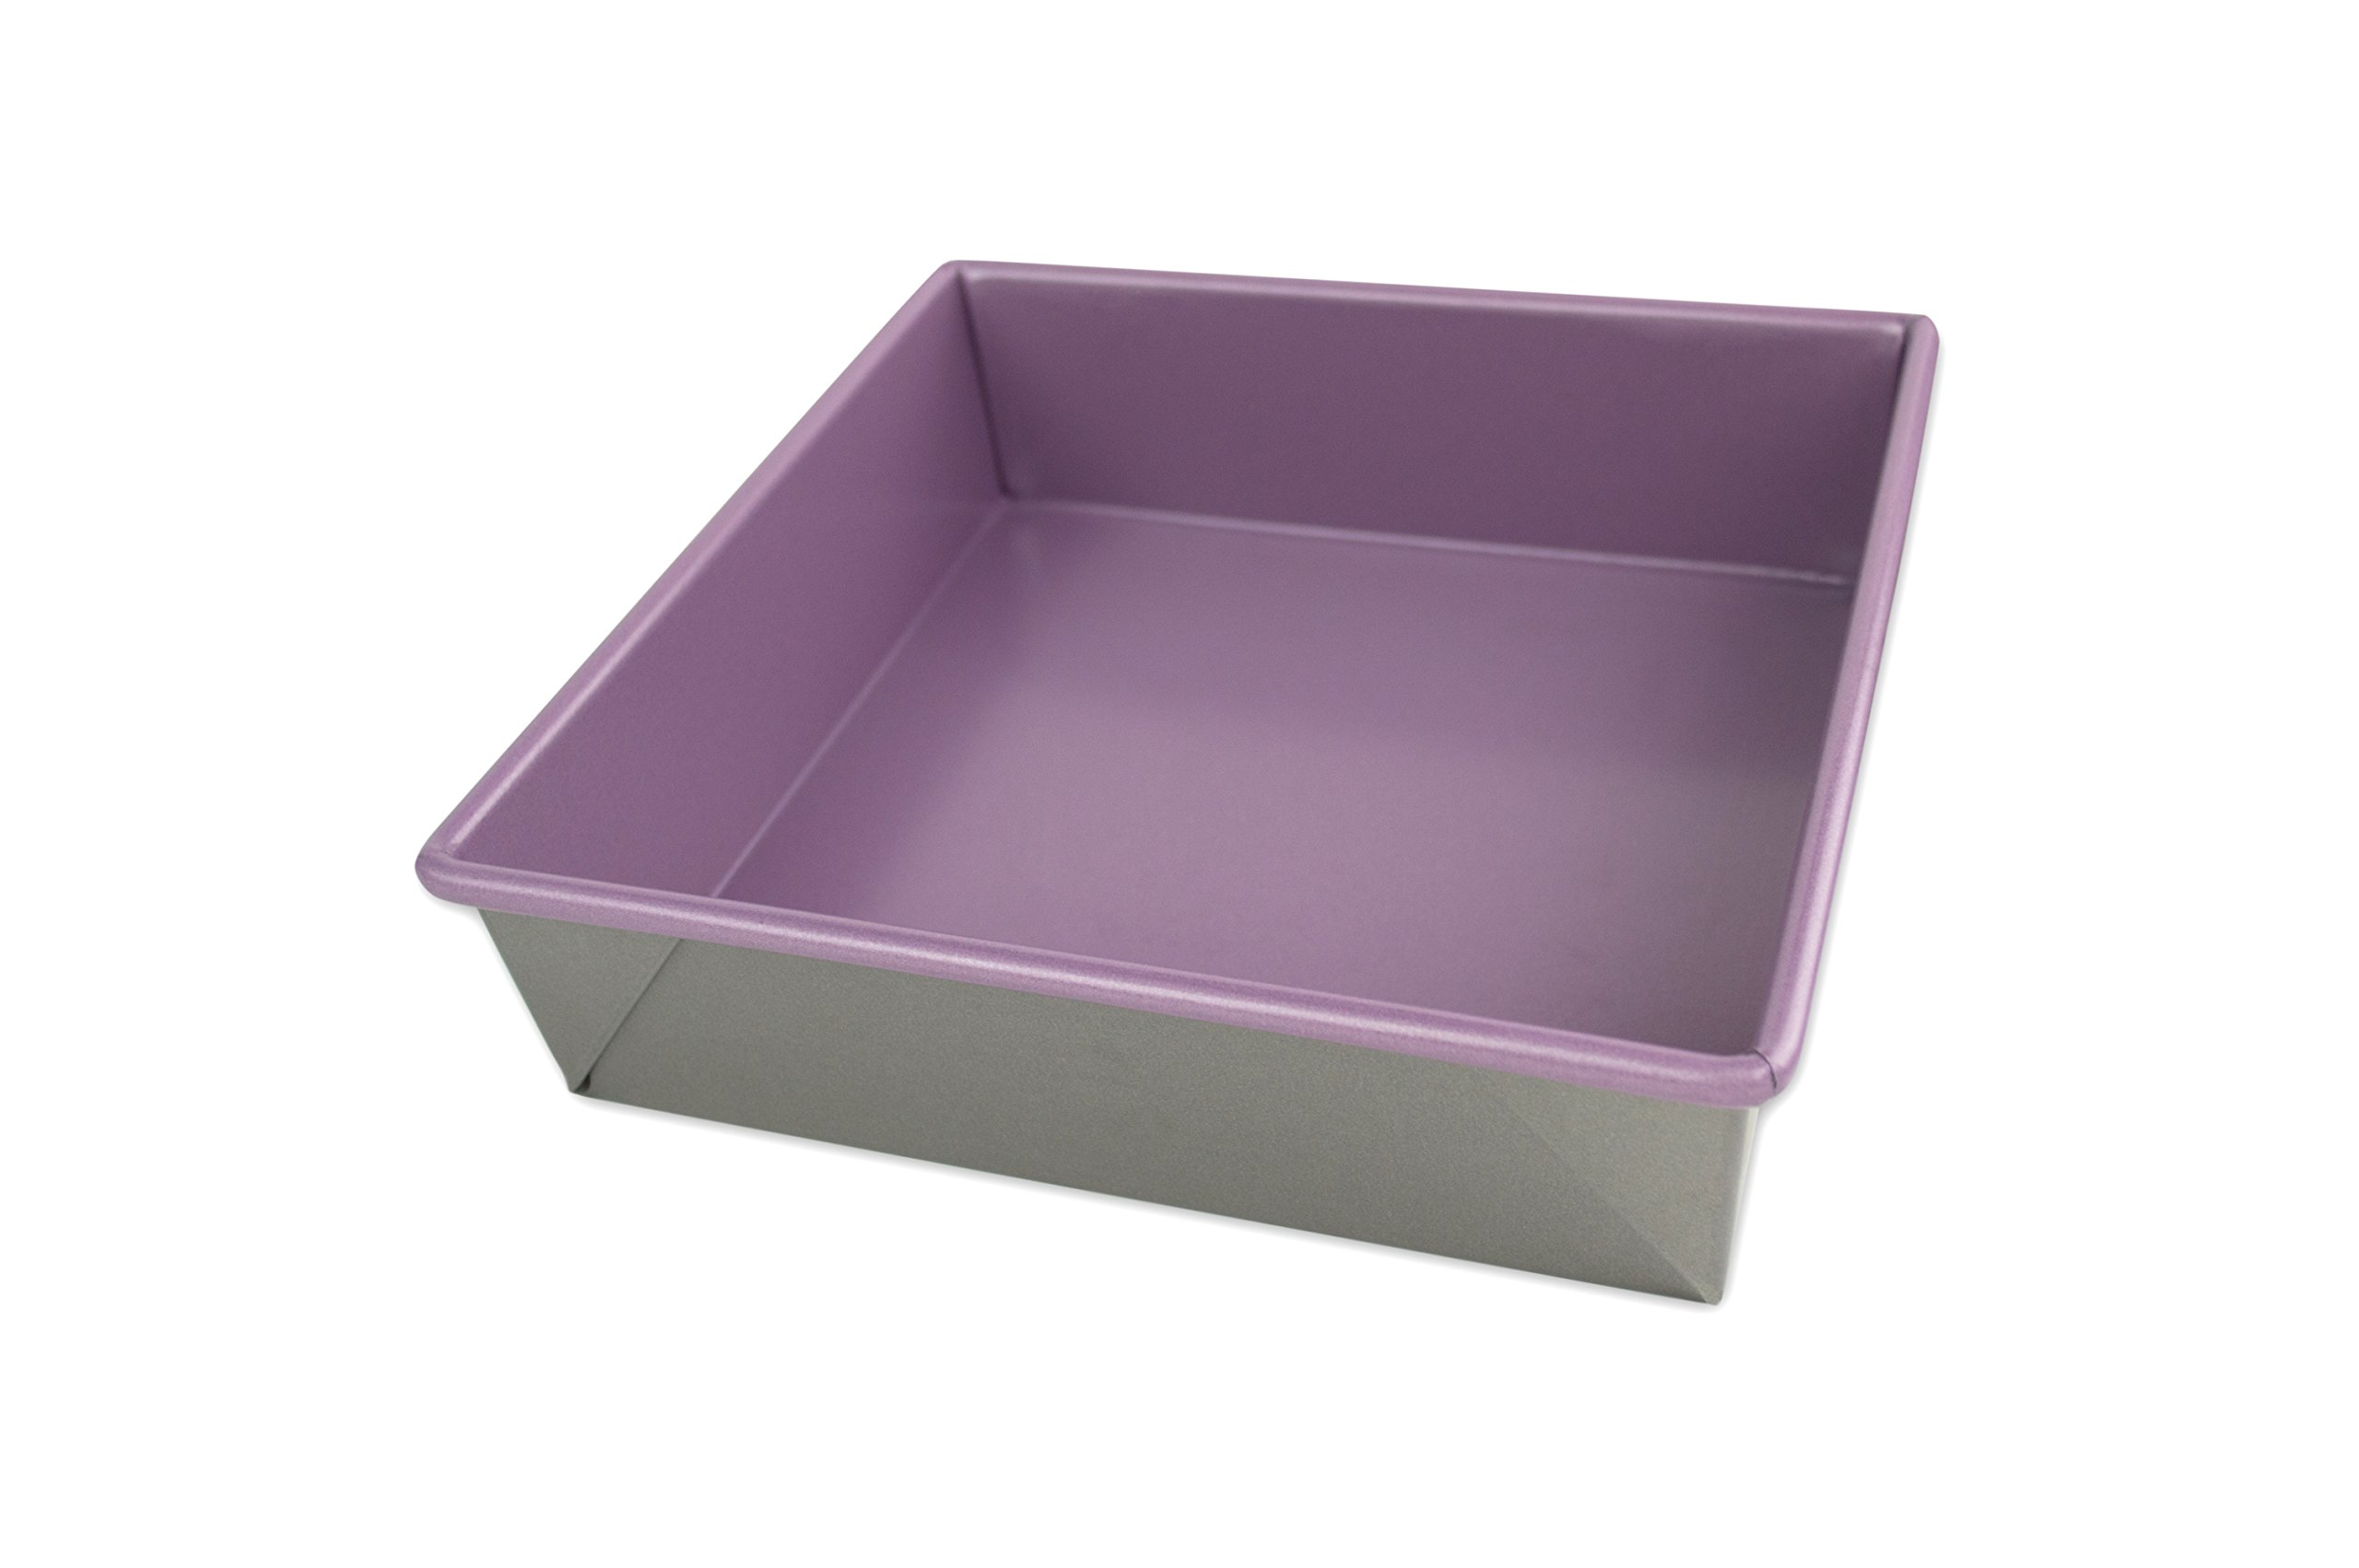 USA Pan 1120BW-AP-1 Allergy Id Nonstick Square Cake Pan, 8-Inch, Purple